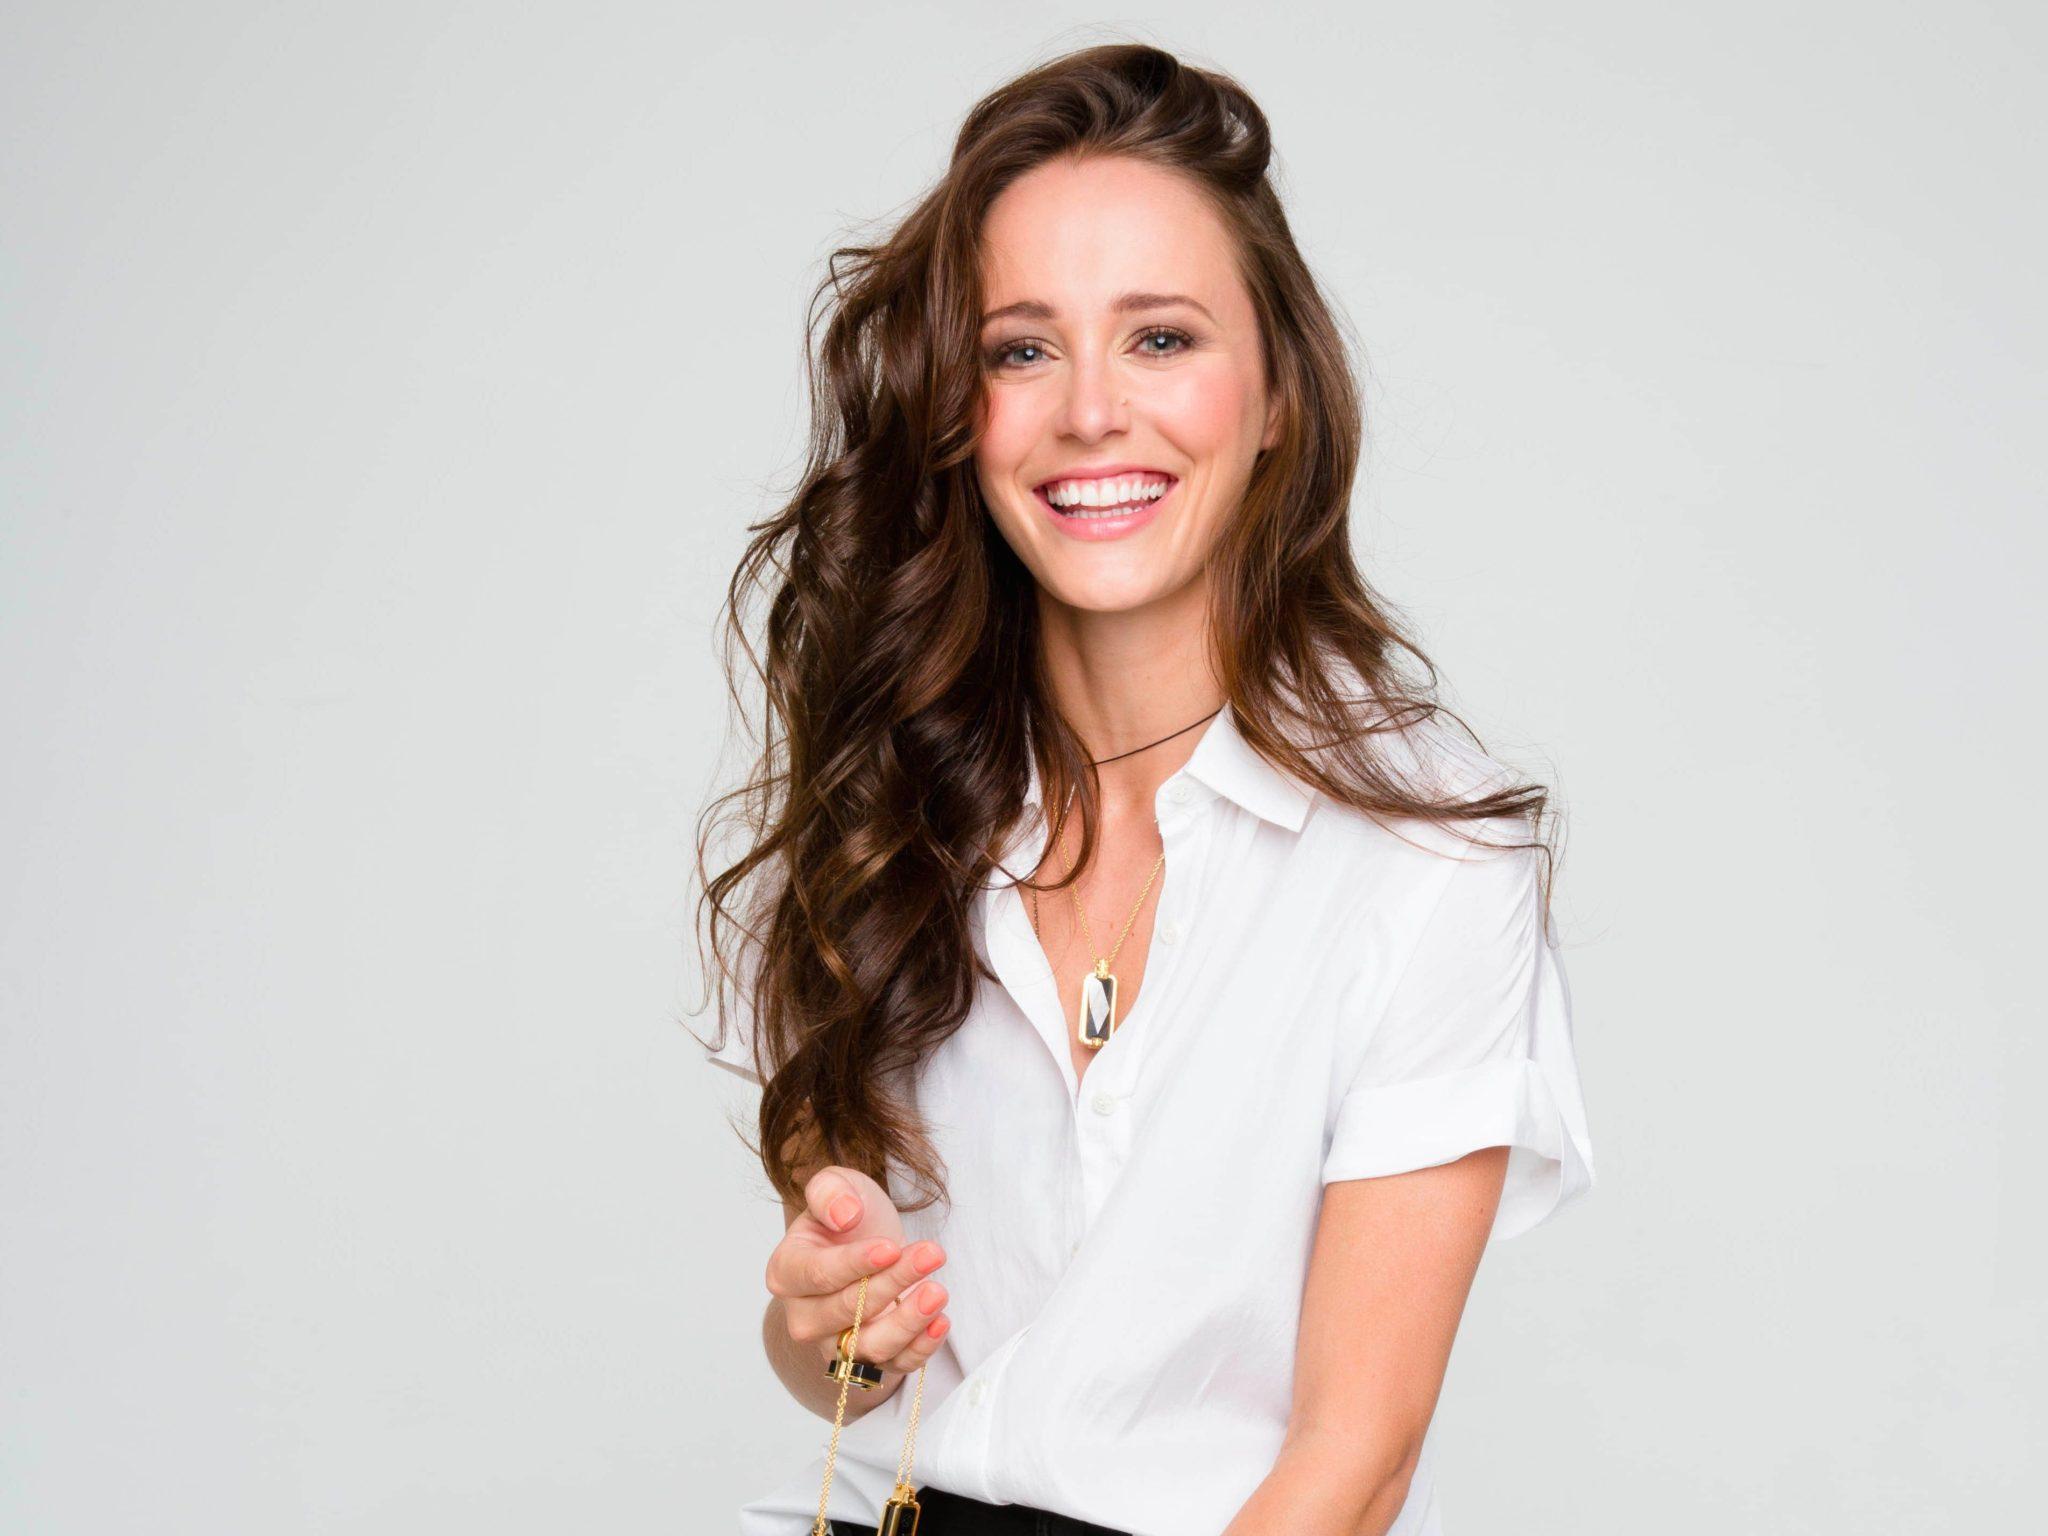 Meet 27 year old tech entrepreneur Kate Unsworth.